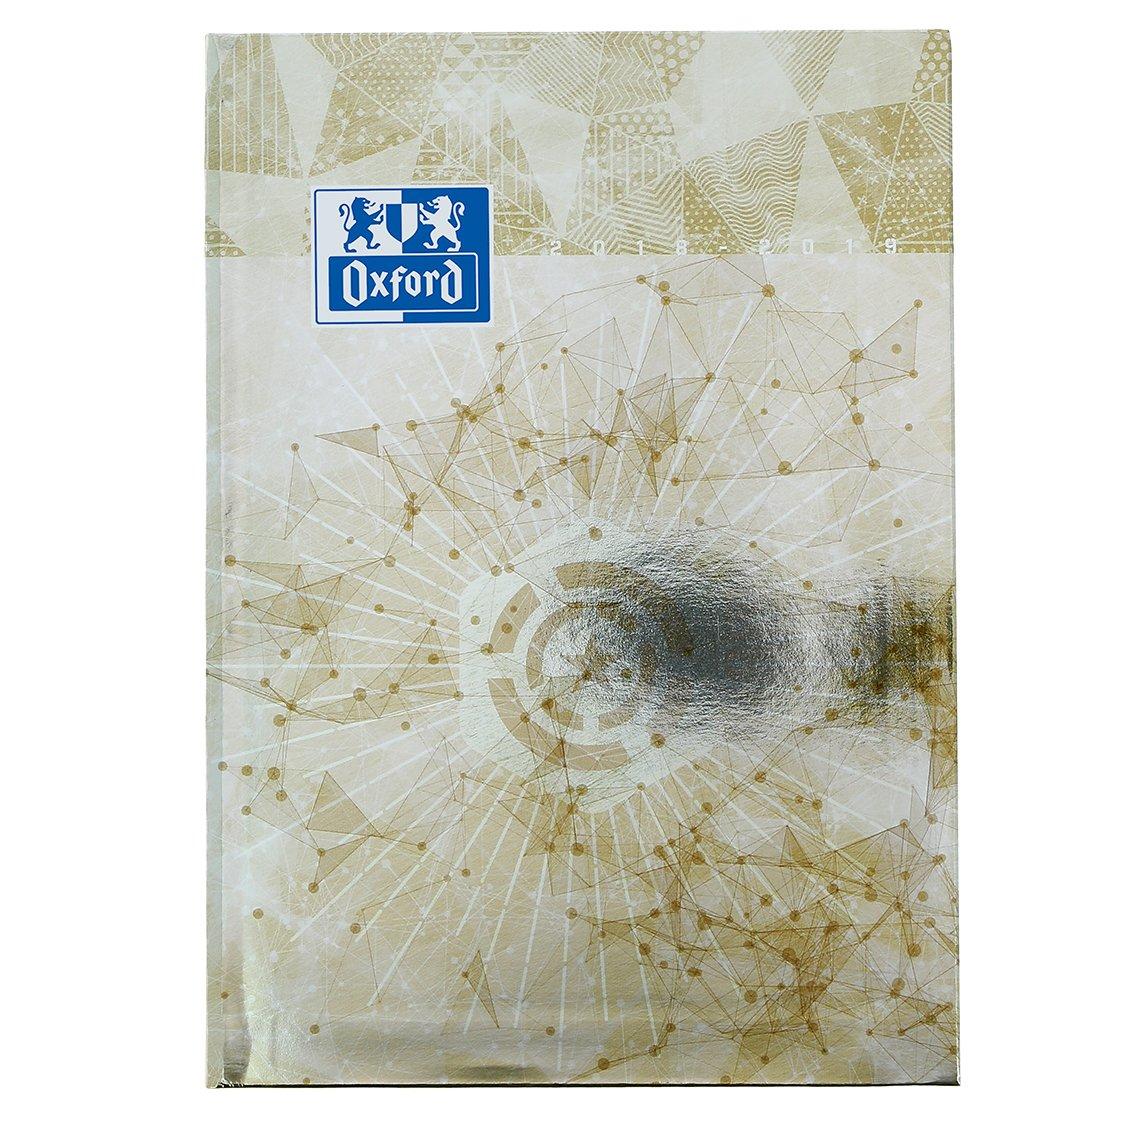 Oxford Metal Agenda Scolaire Journalier 2018-2019 1 Jour Page 352 Pages 15x21 Bleu 400082331